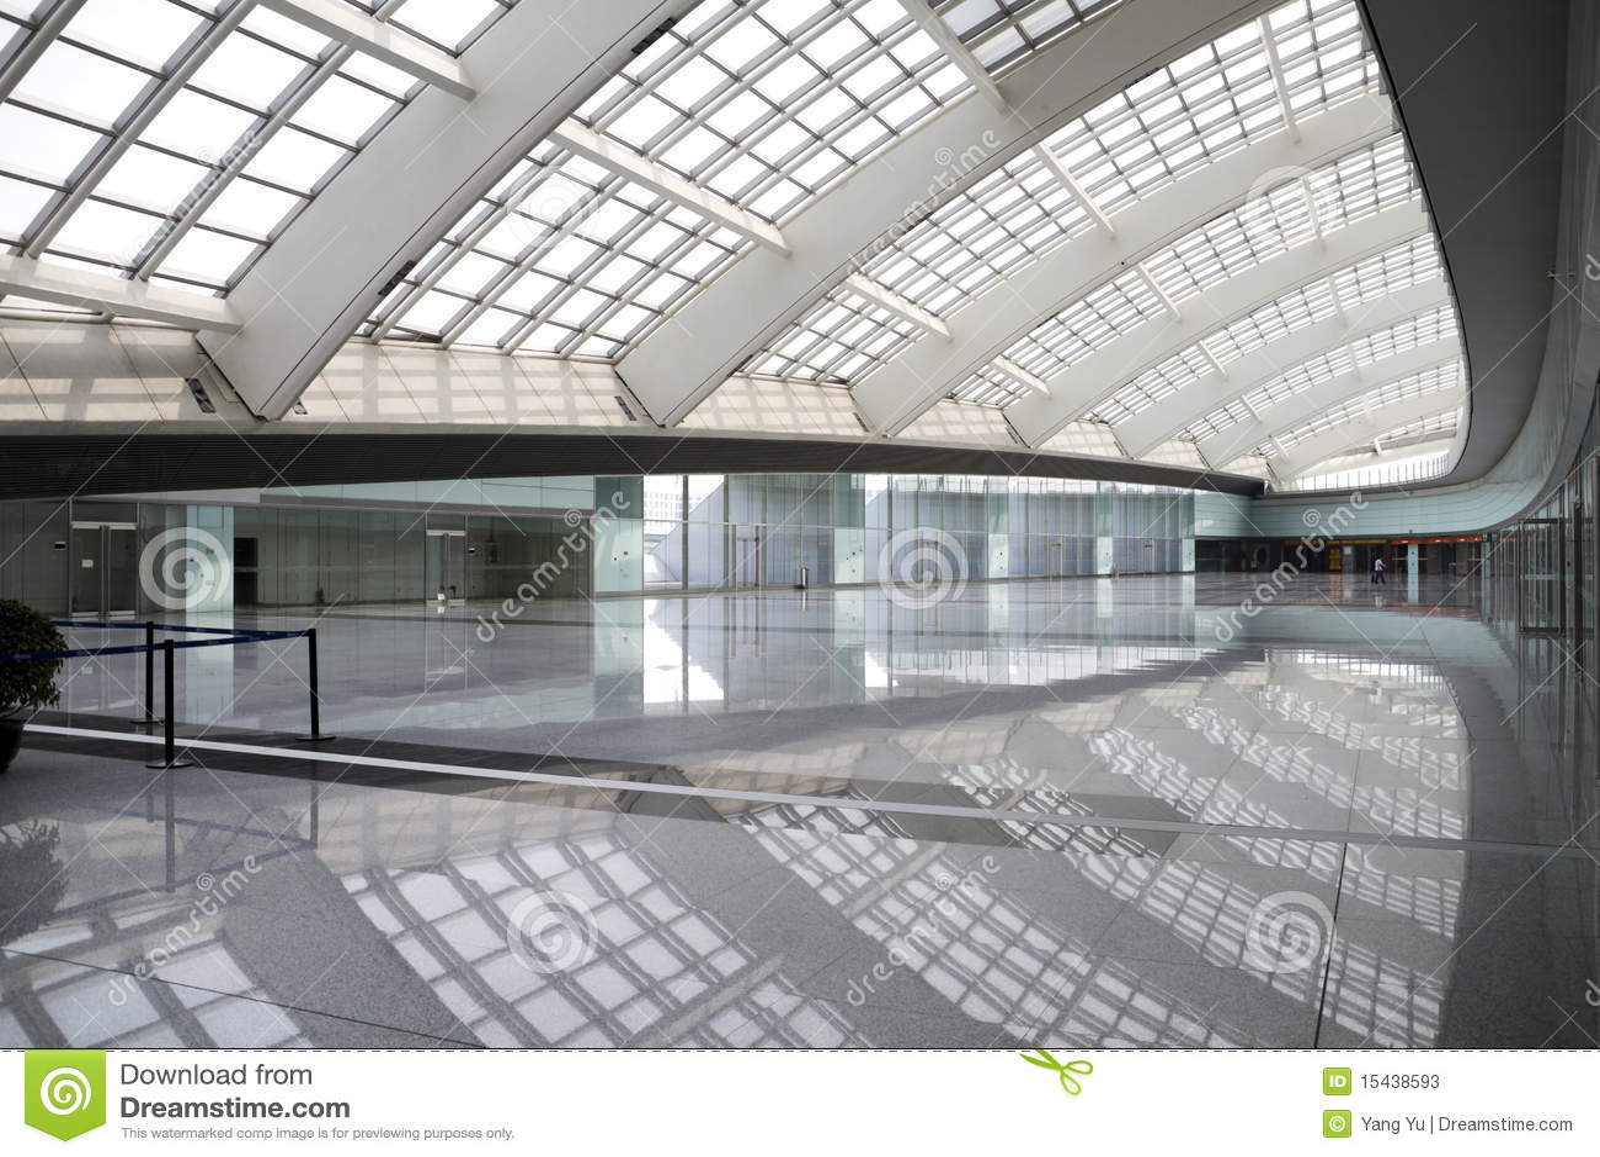 Modern hall in beijing T3 airport